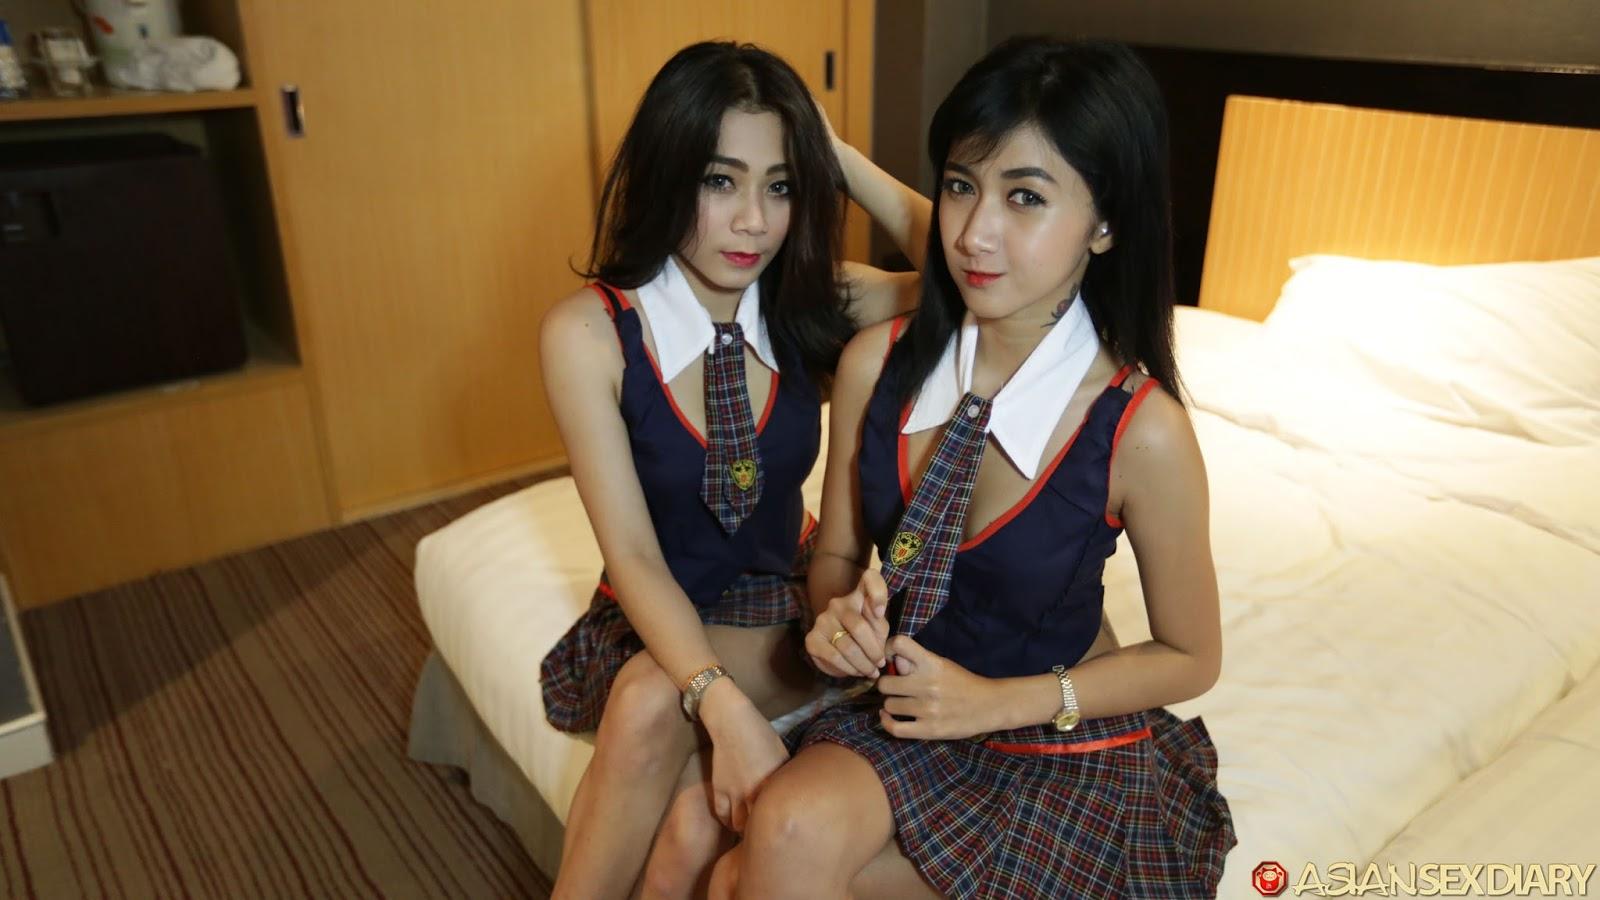 Busty Japanese Girl Threesome